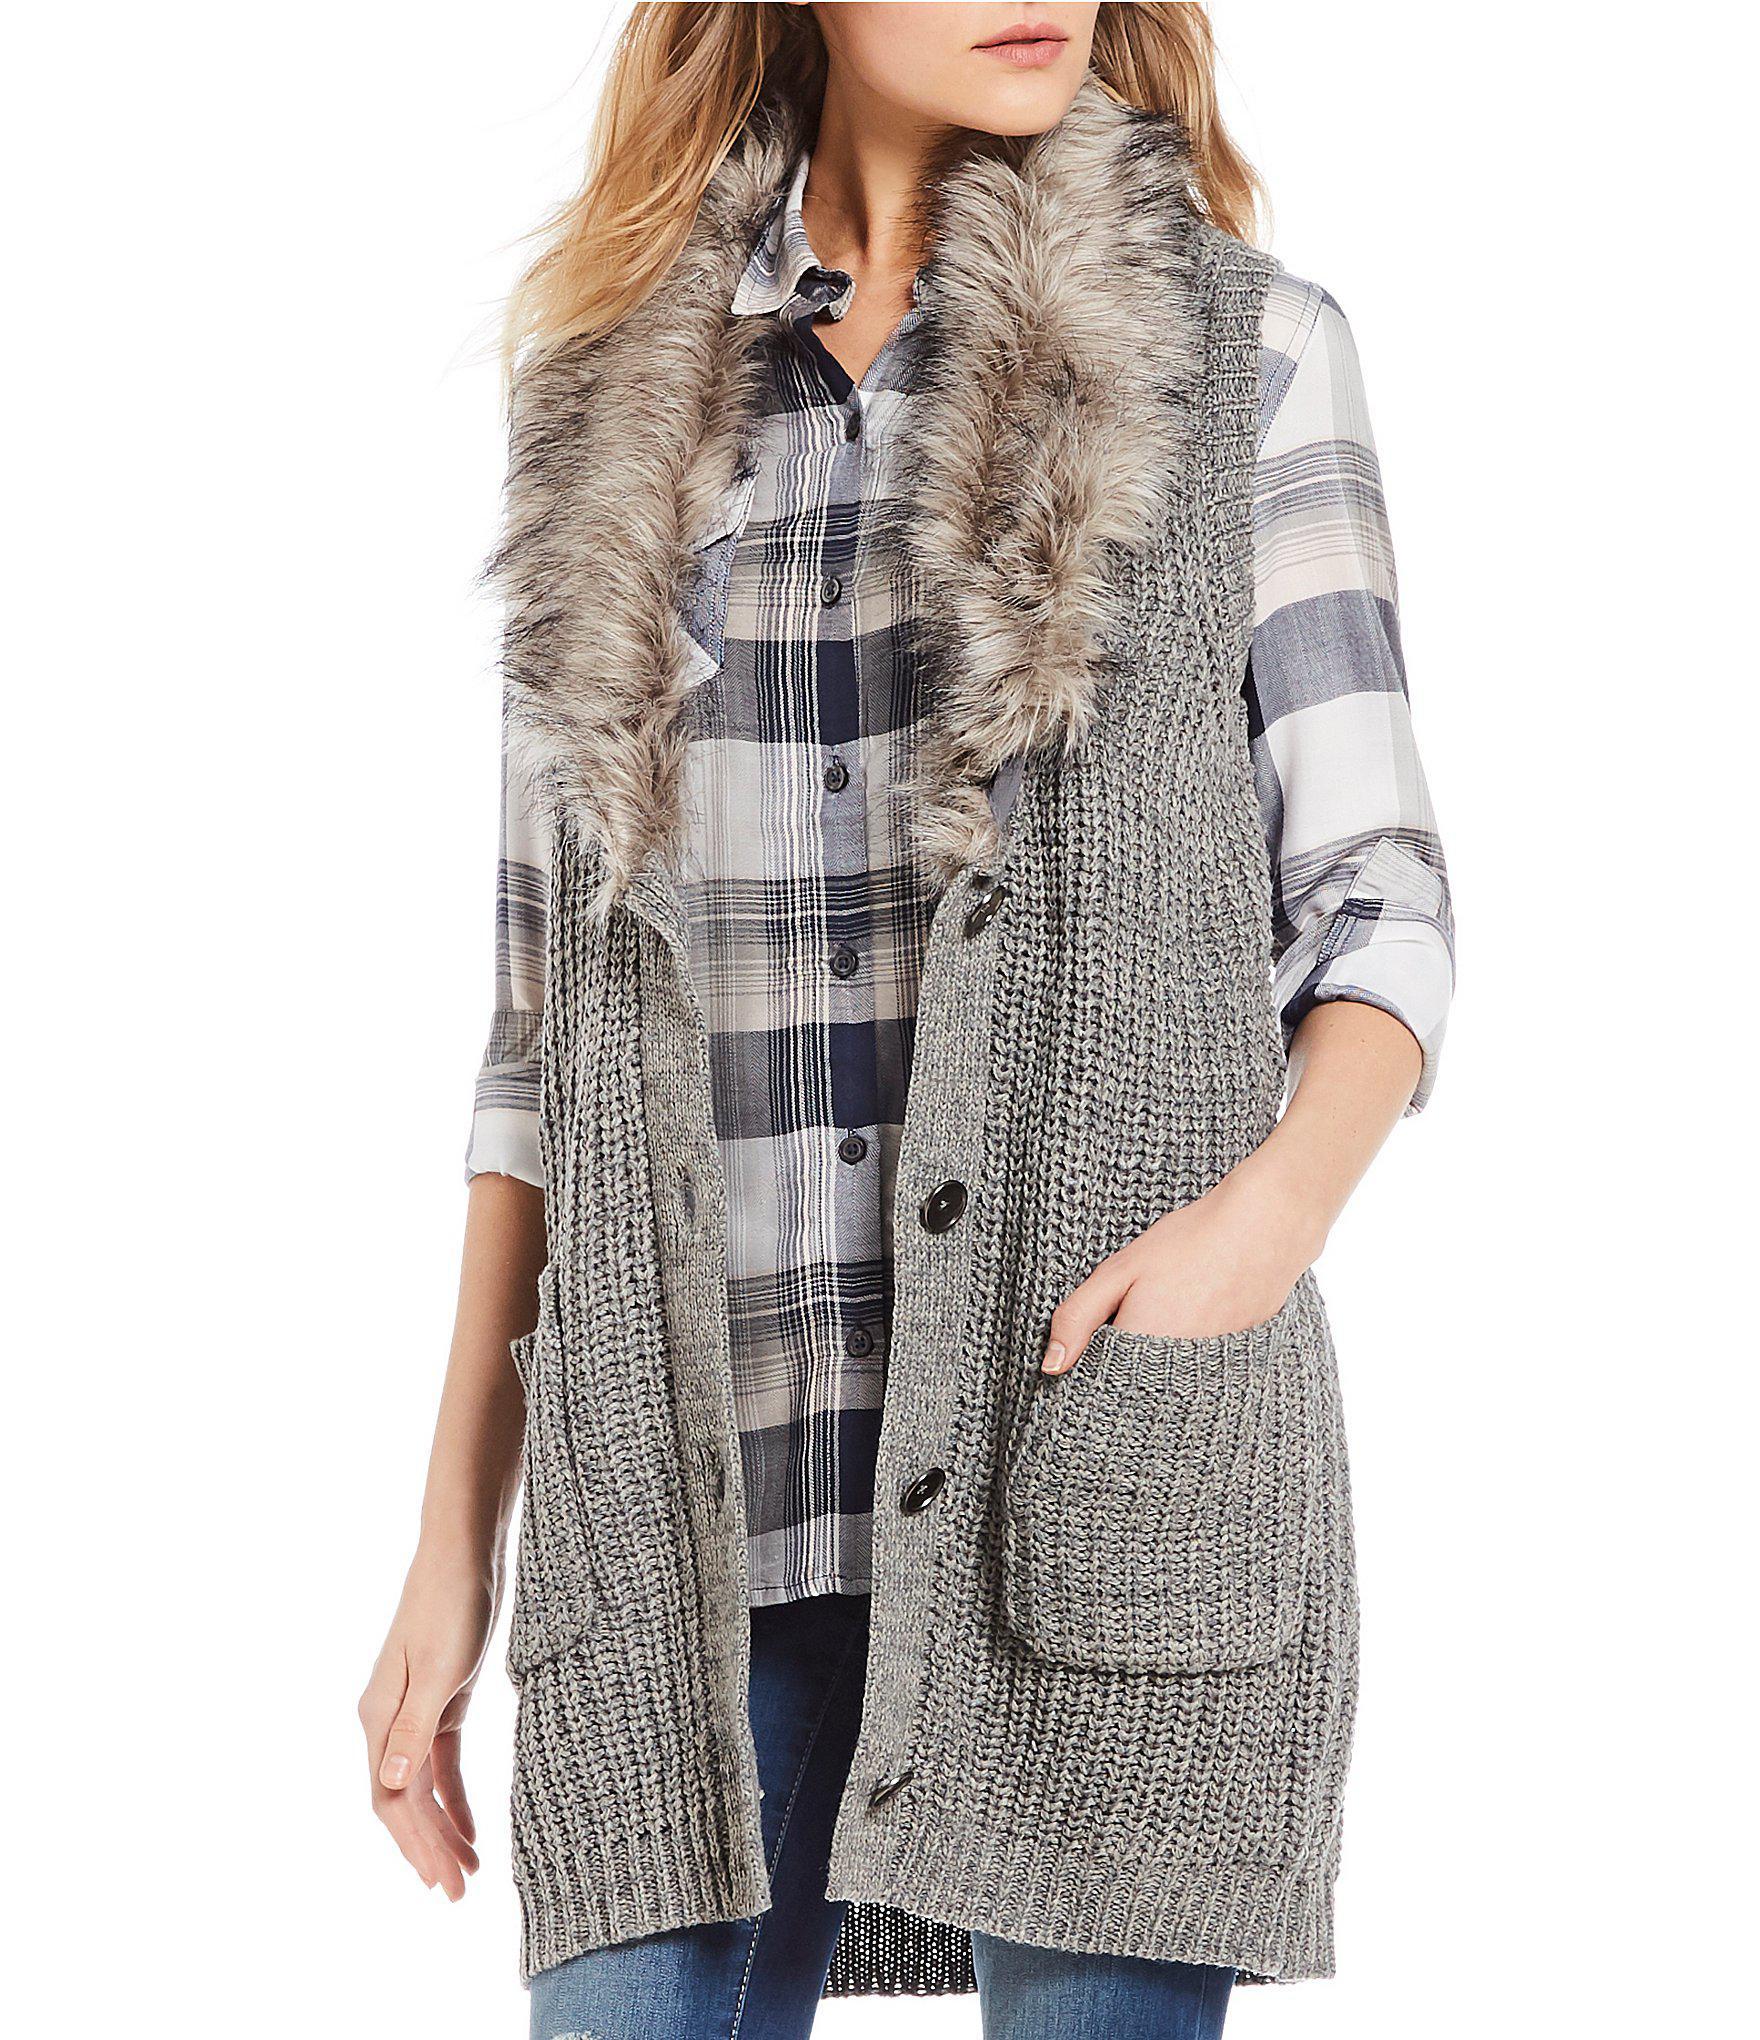 13e28aa36 Jessica Simpson Adler Faux Fur Vest in Gray - Lyst